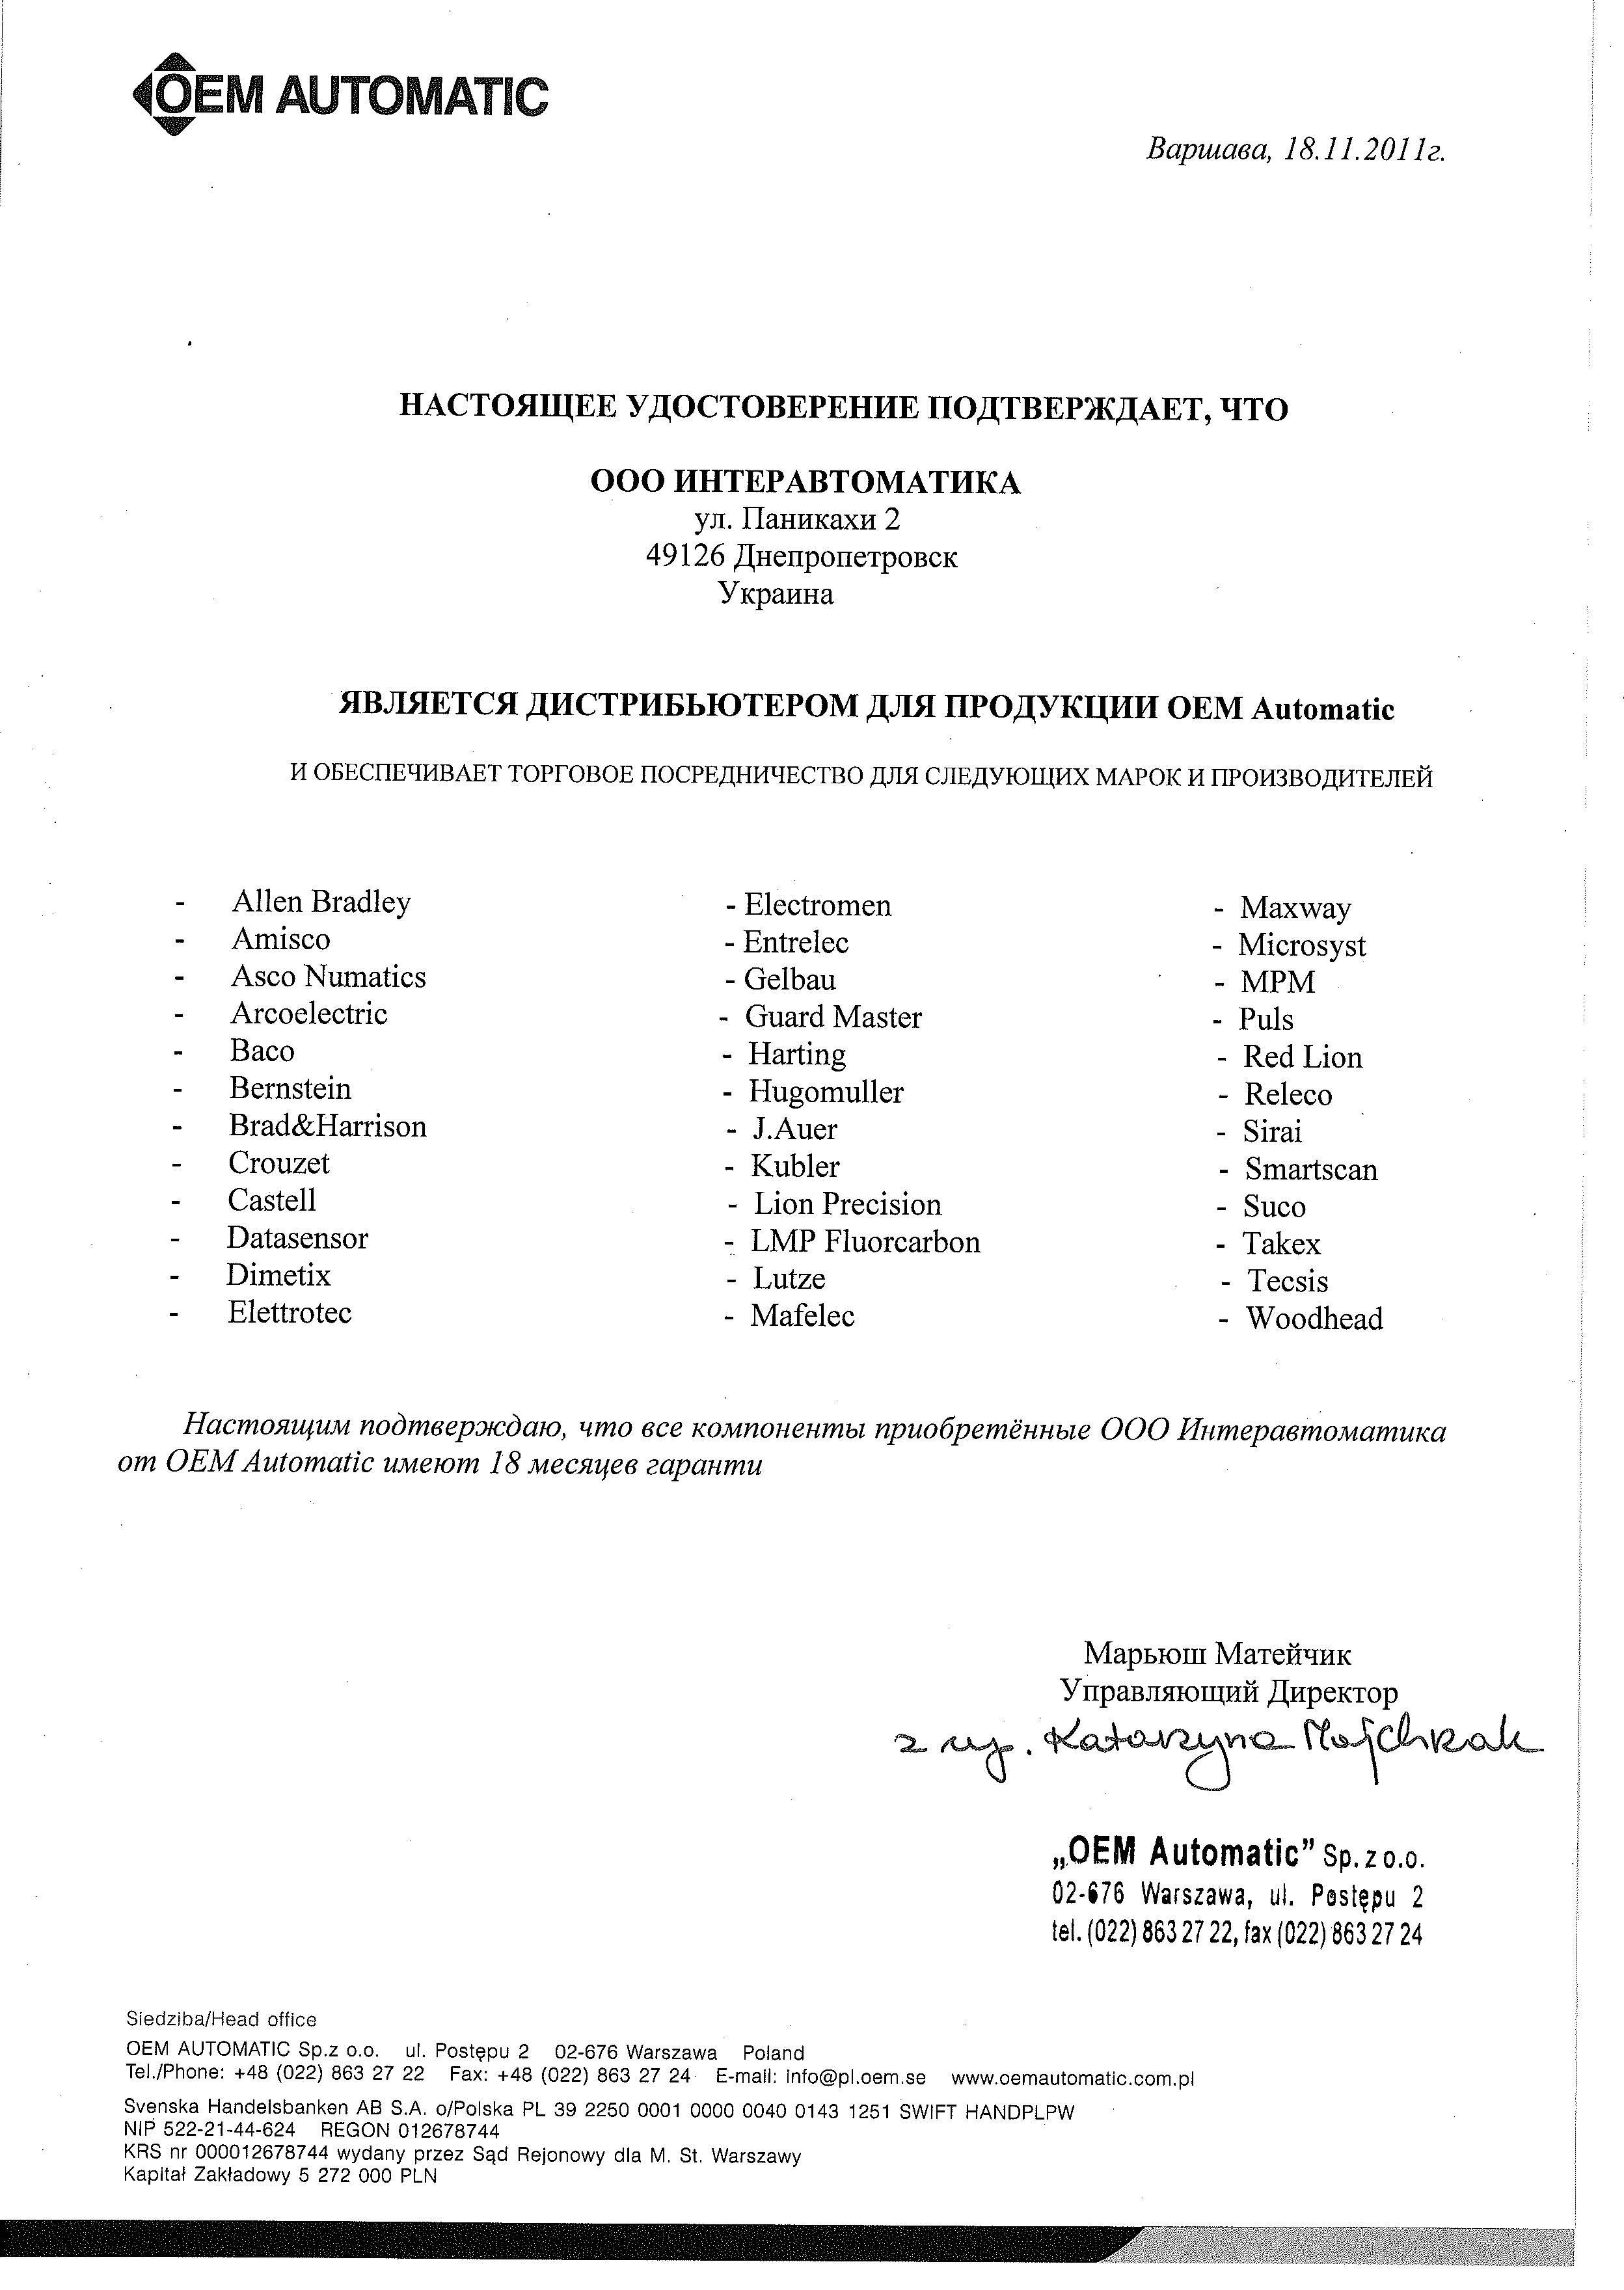 Сертификат торговли OEM AUTOMATIC - Интеравтоматика